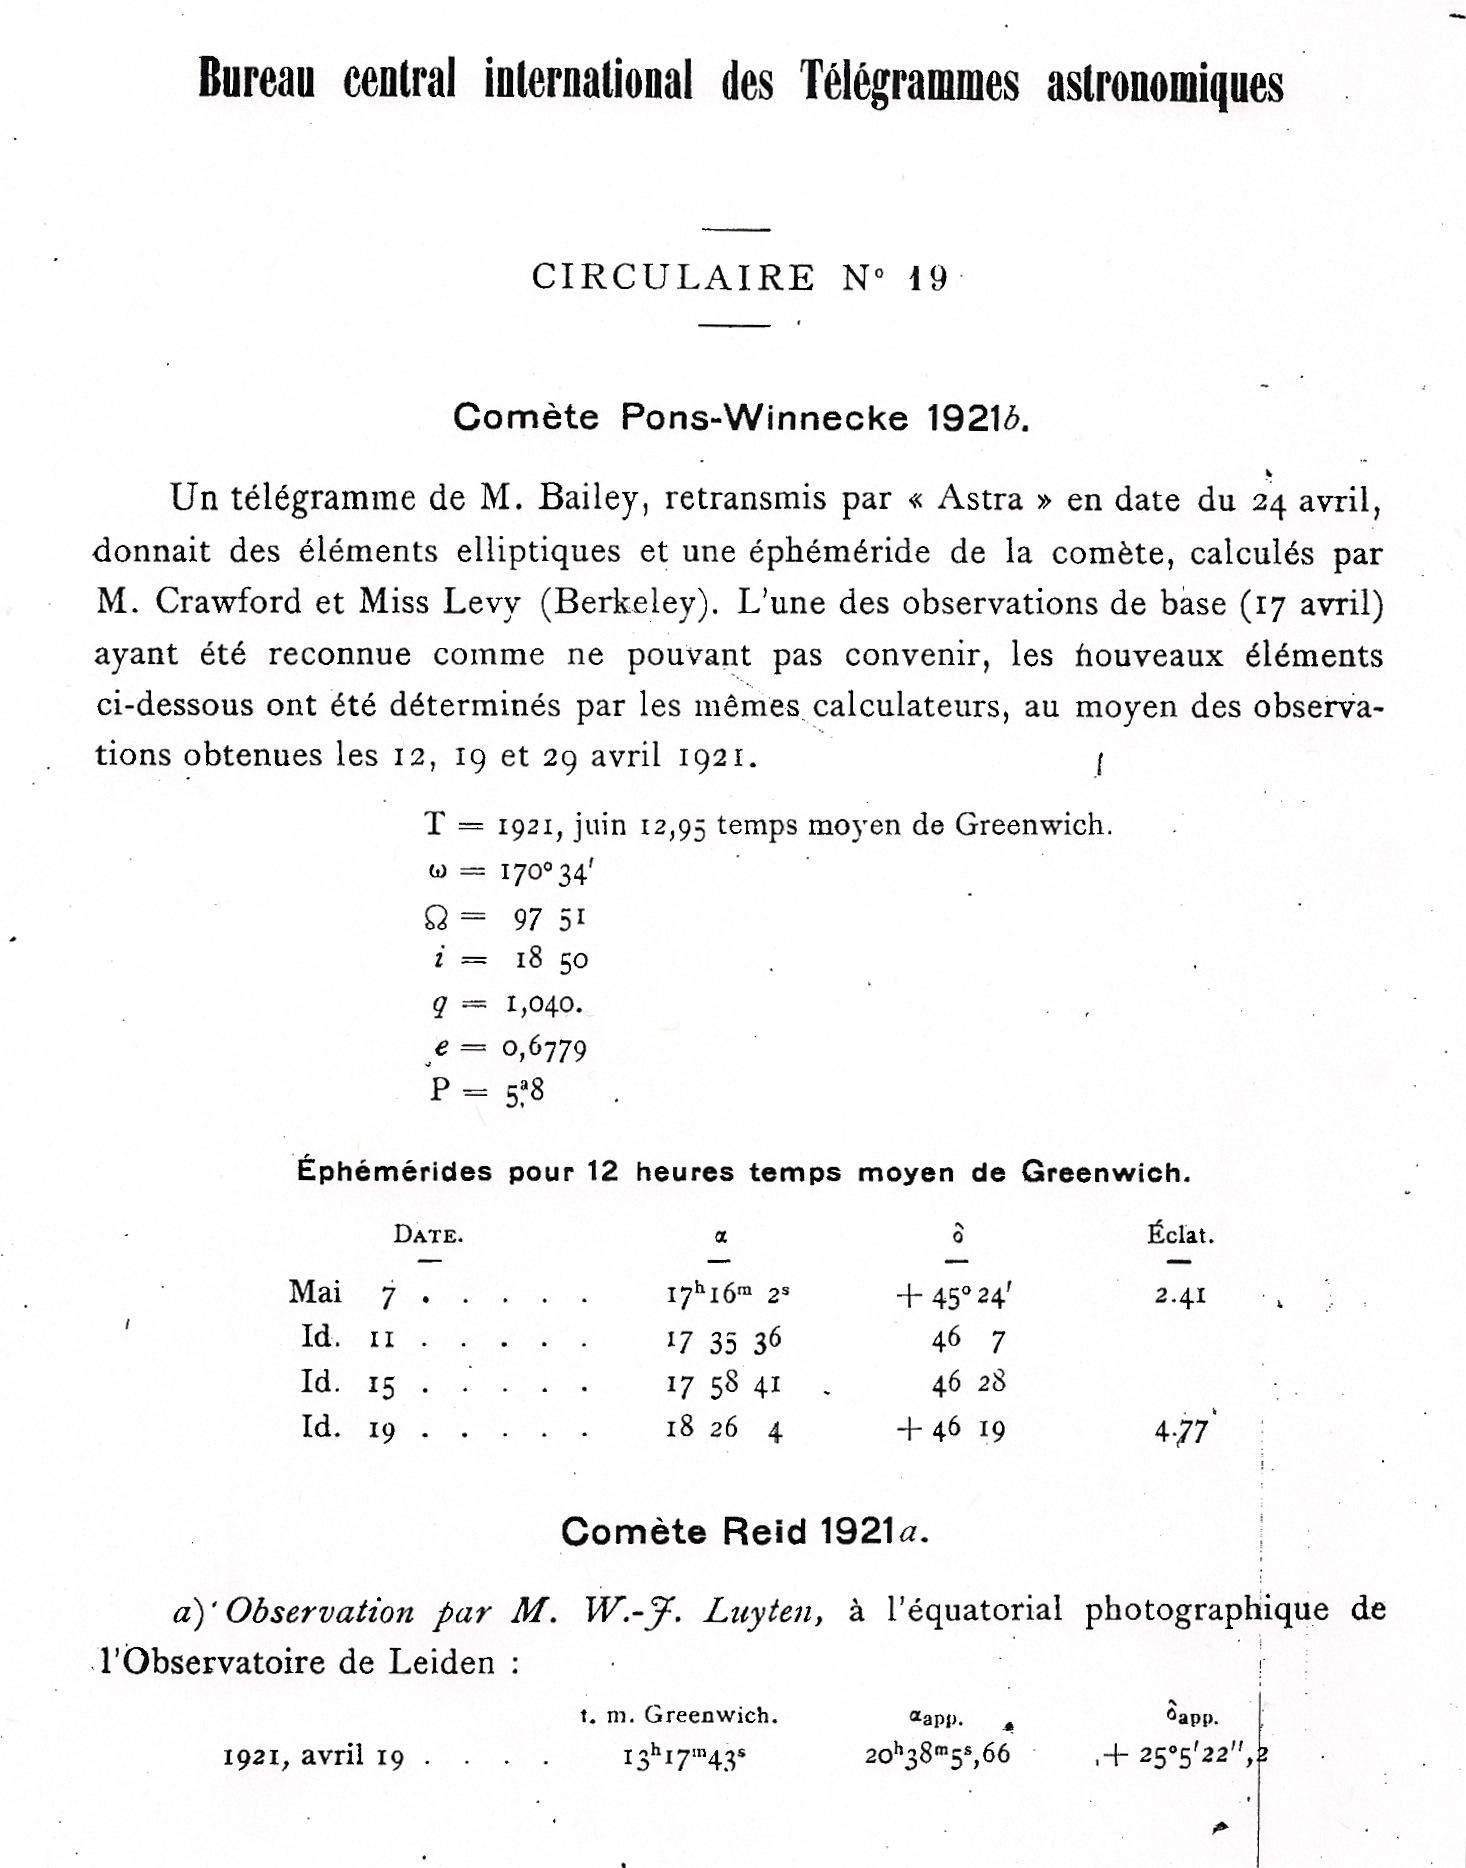 International Astronomical Union Circulars